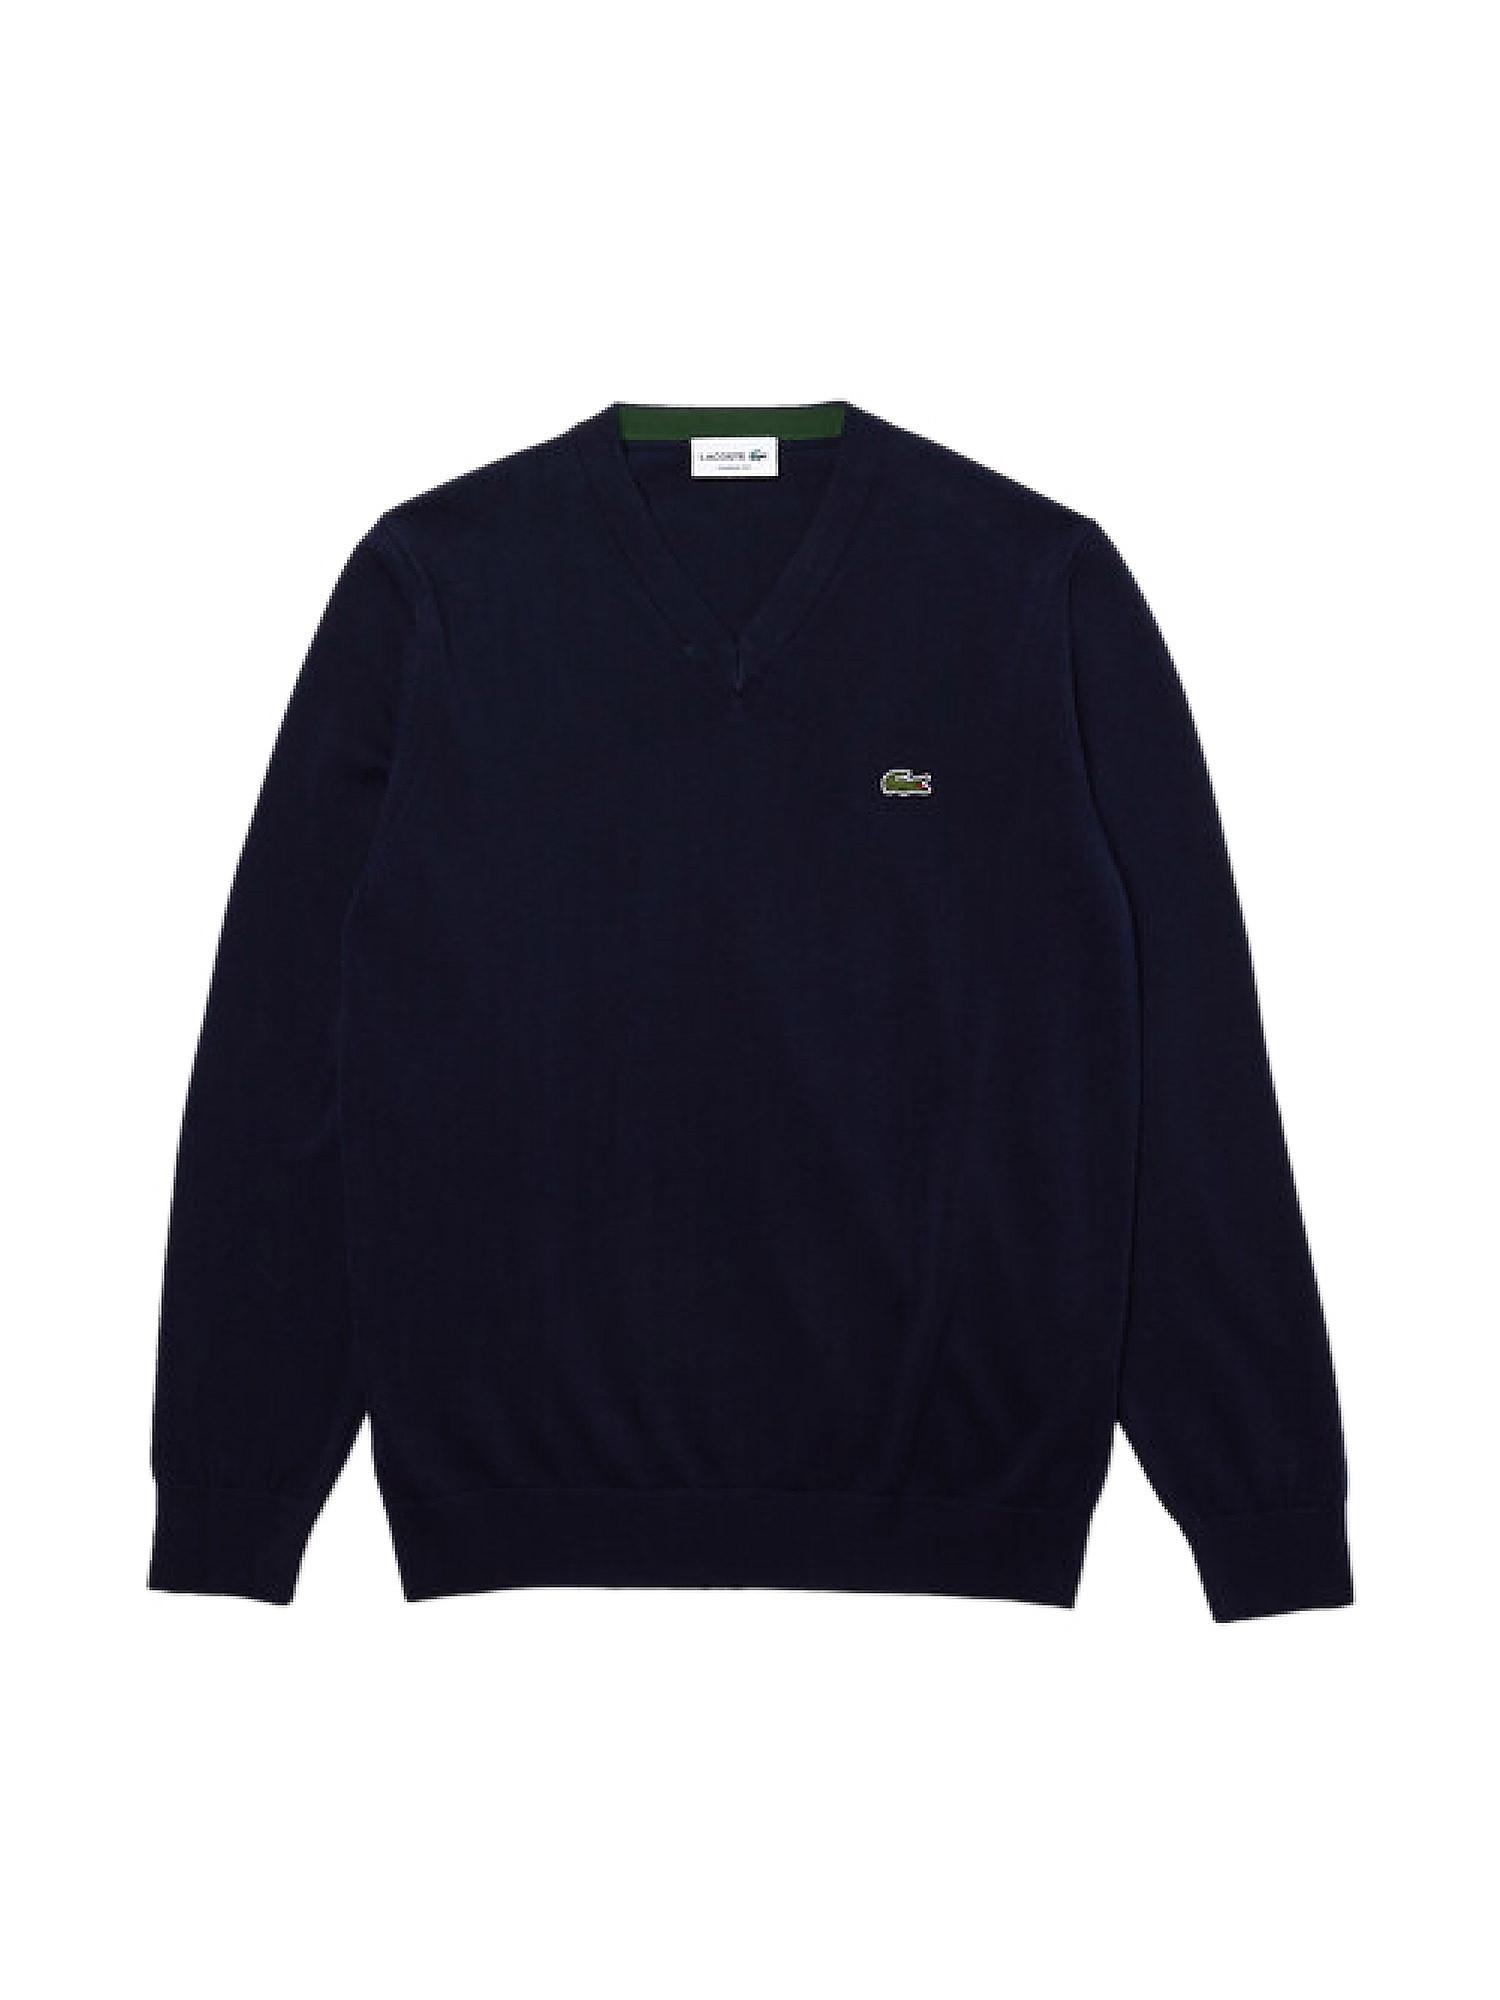 Pullover uomo scollo a V in cotone, Blu, large image number 0